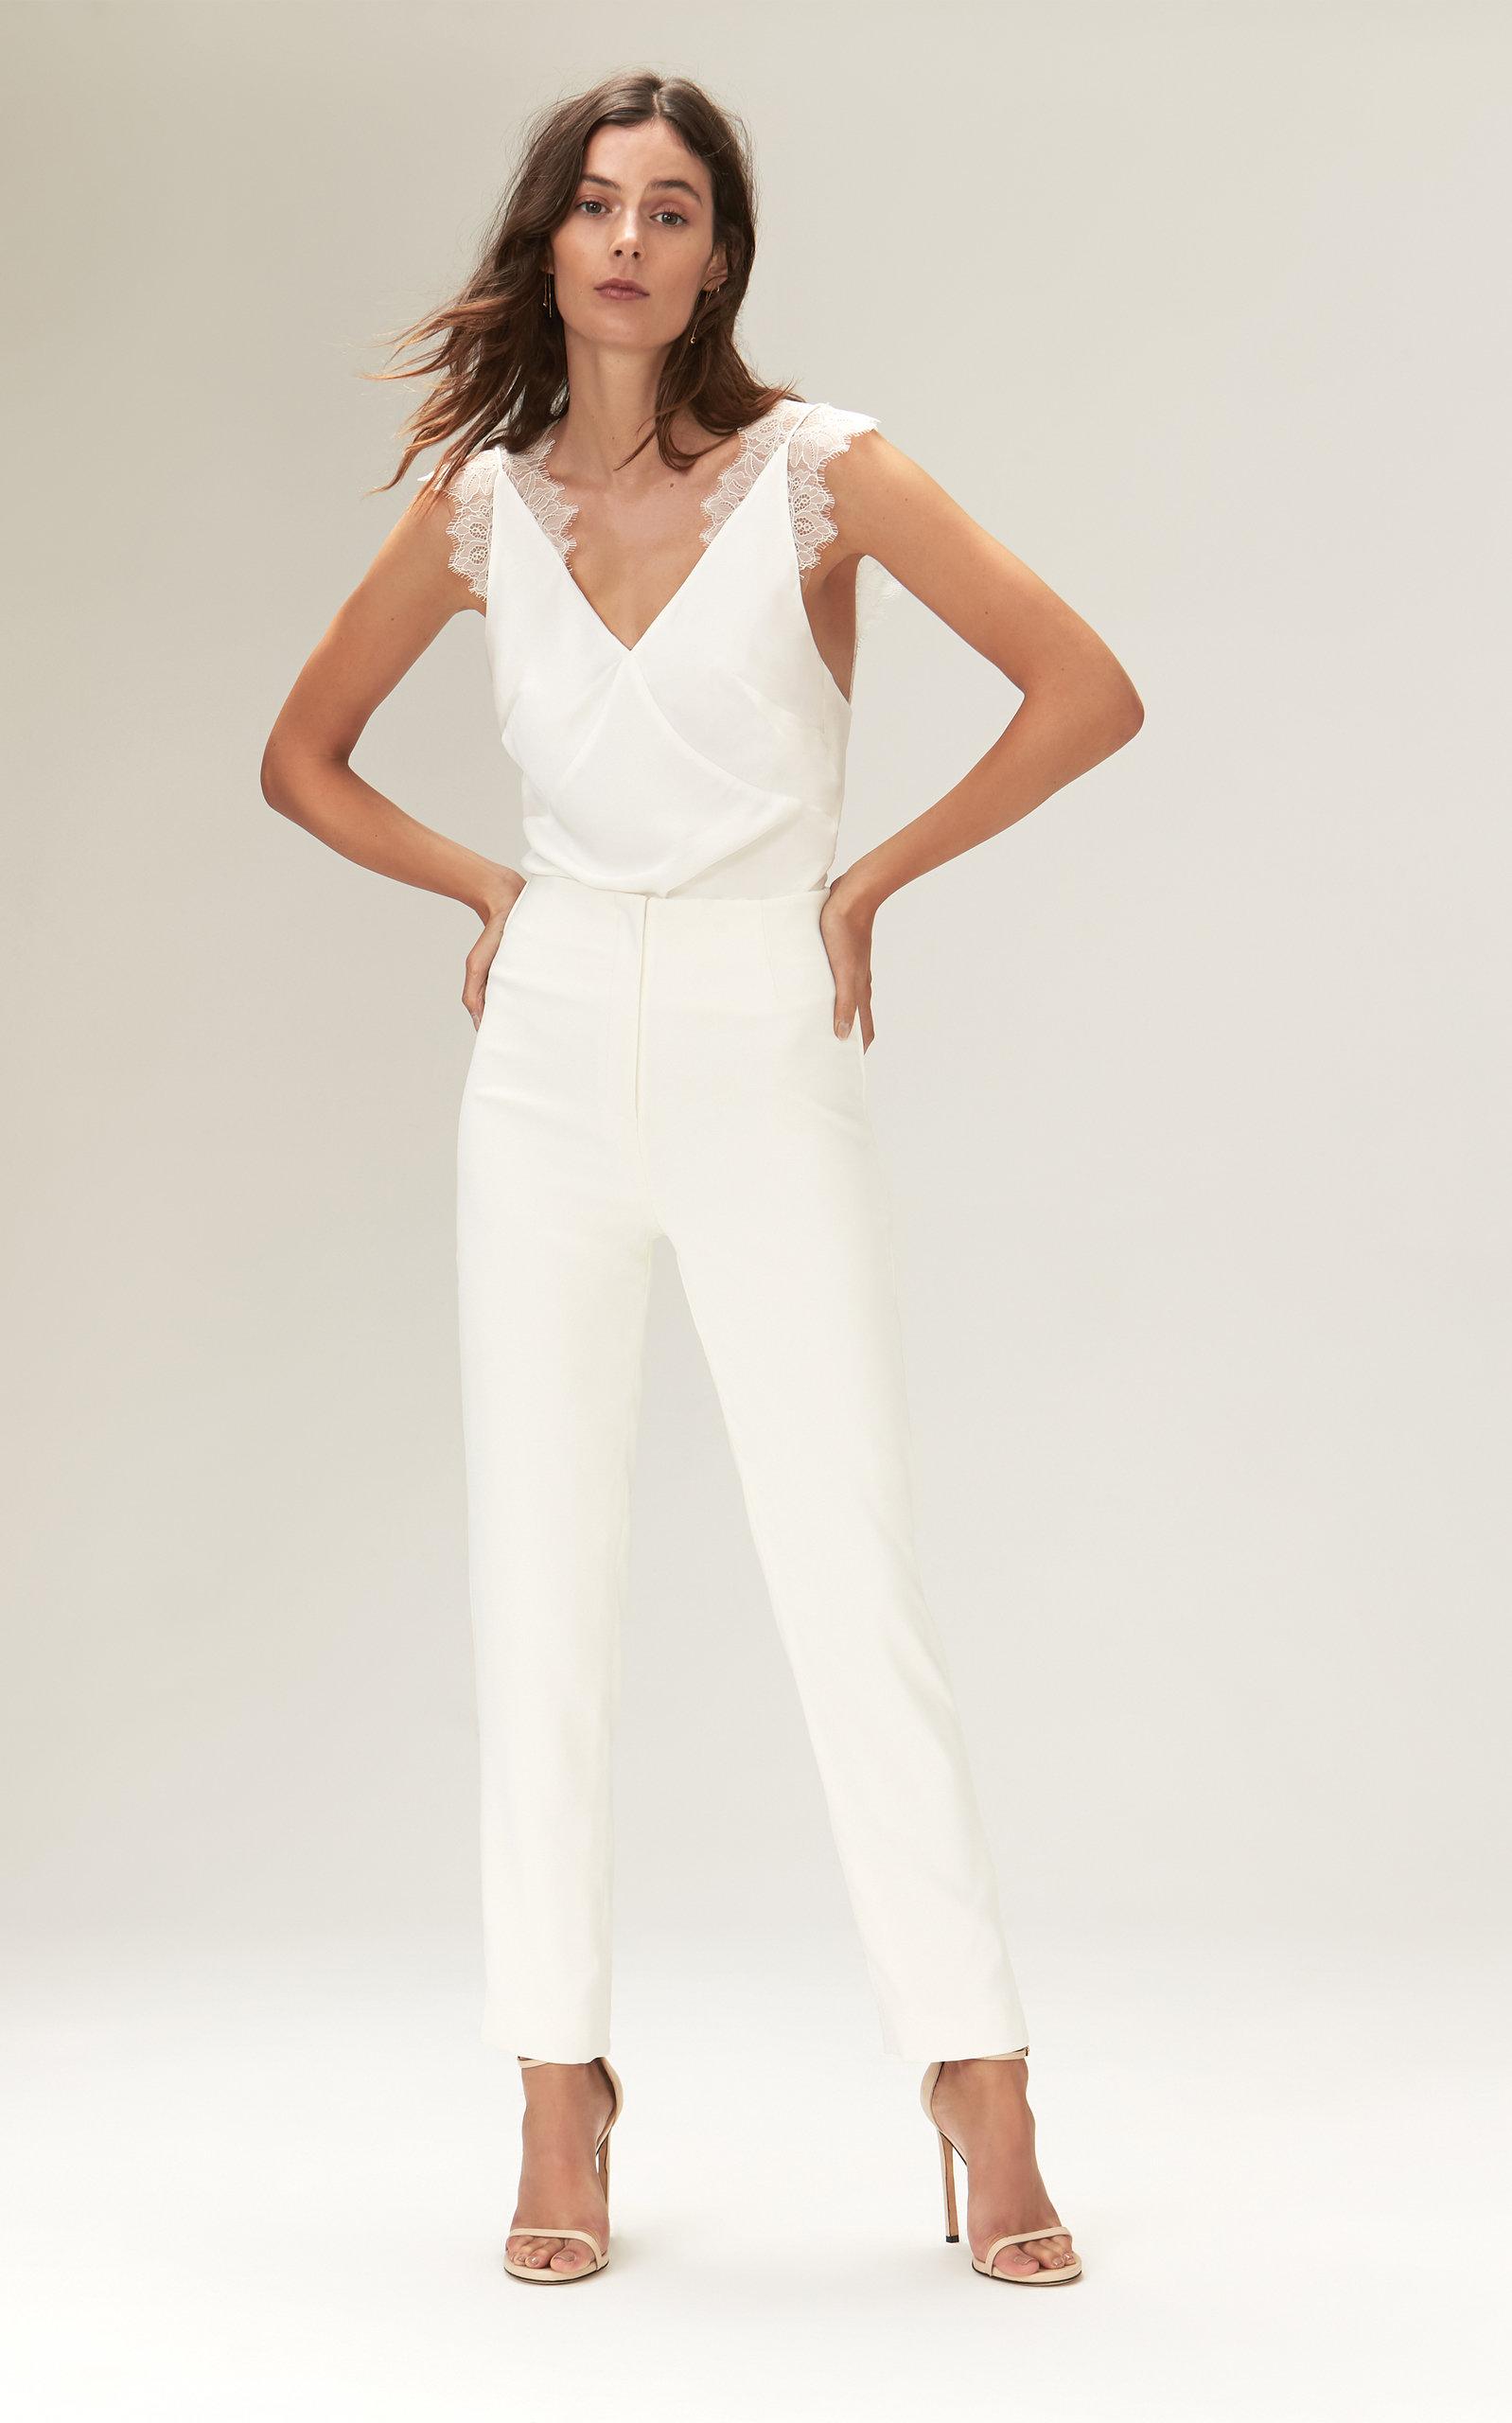 Savannah Miller - Lorraine Crepe Bodysuit With Chantilly Lace Straps